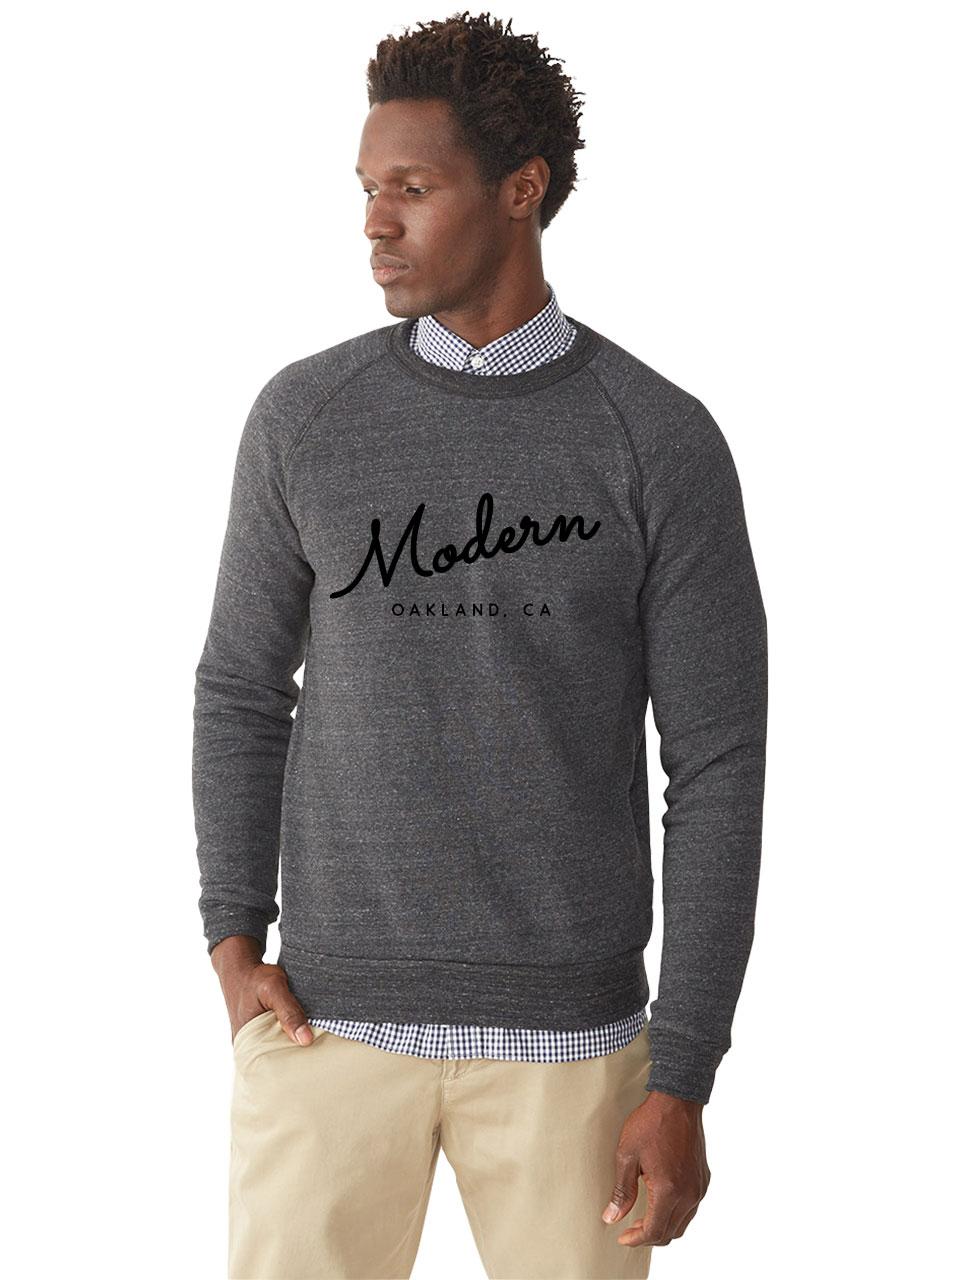 sweatshirt_mockup-R3-C-black-2